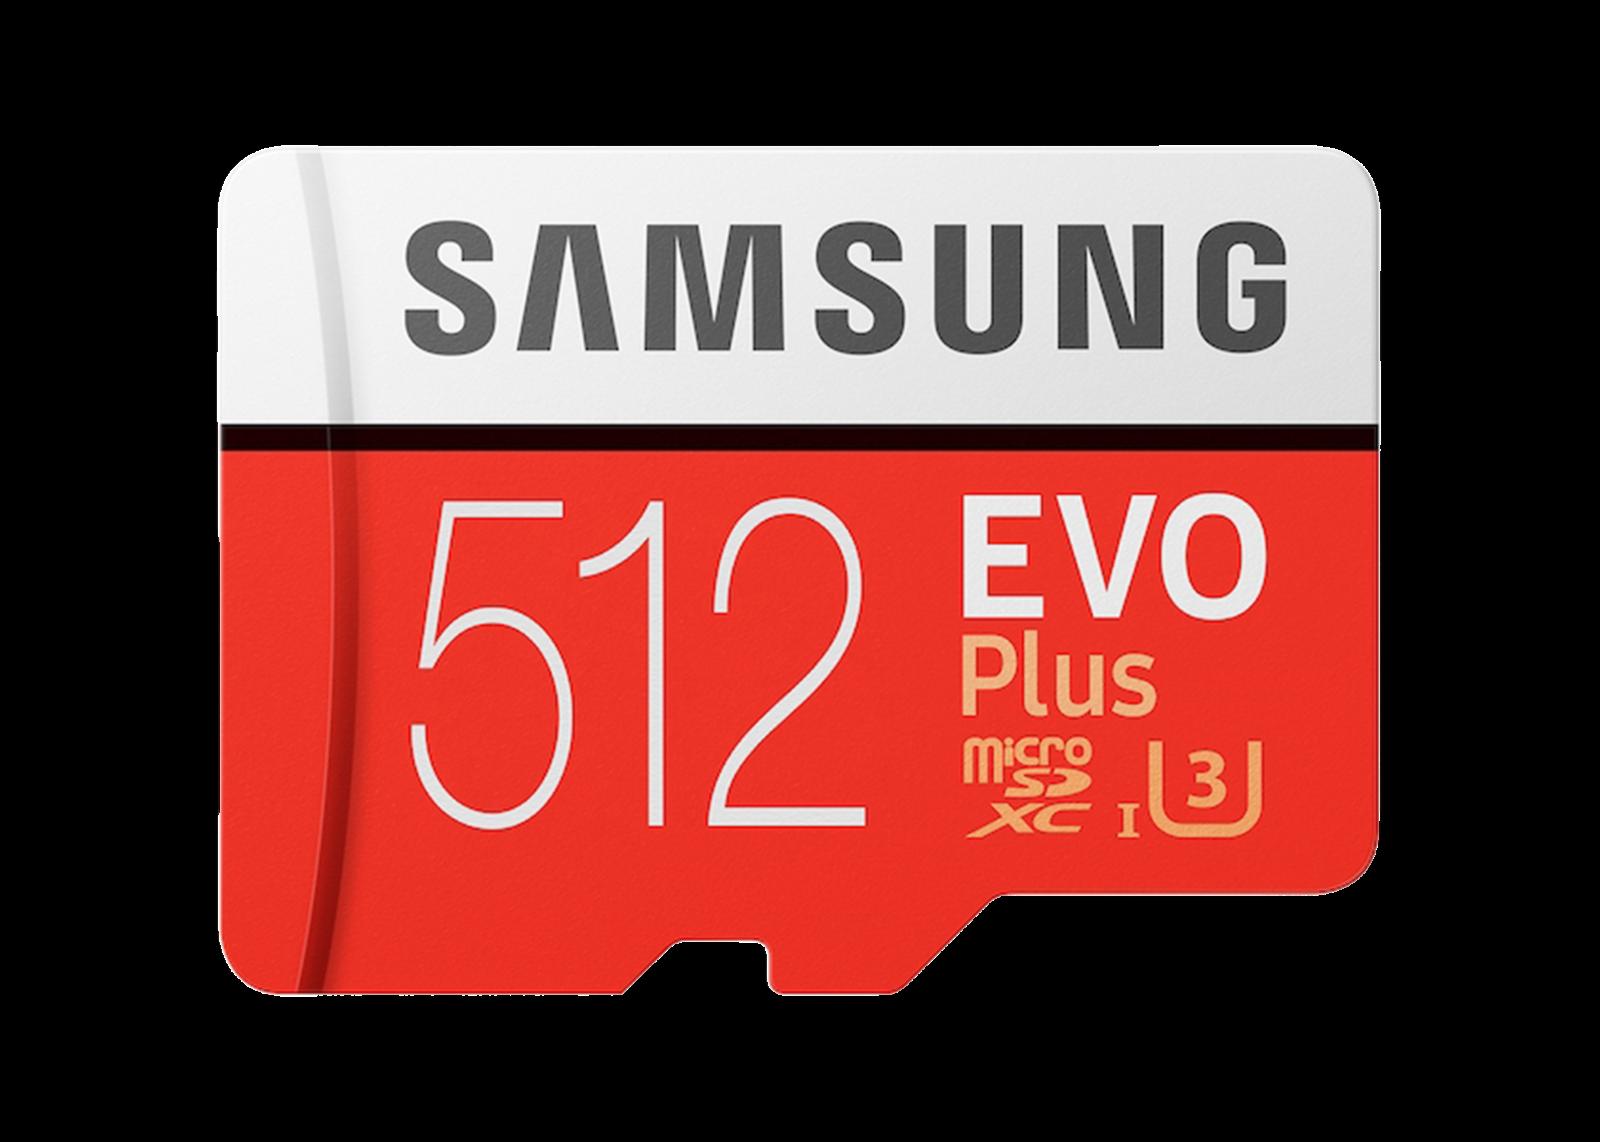 Samsung Micro SD Card Evo Plus 64GB 128GB 256GB 512GB Smartphone & Tablet lot